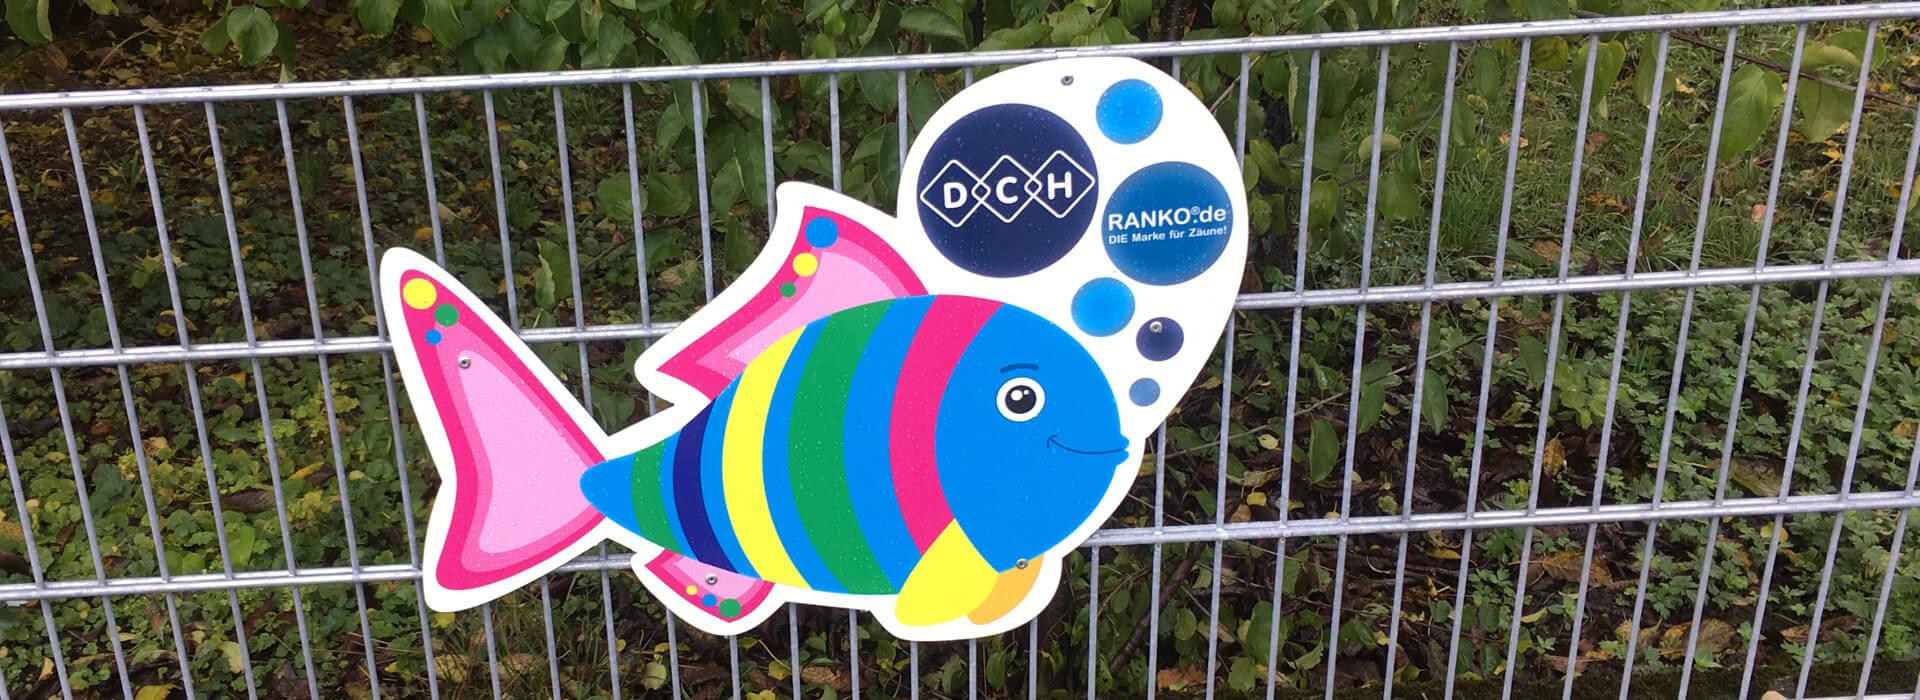 Zaundeko Fisch